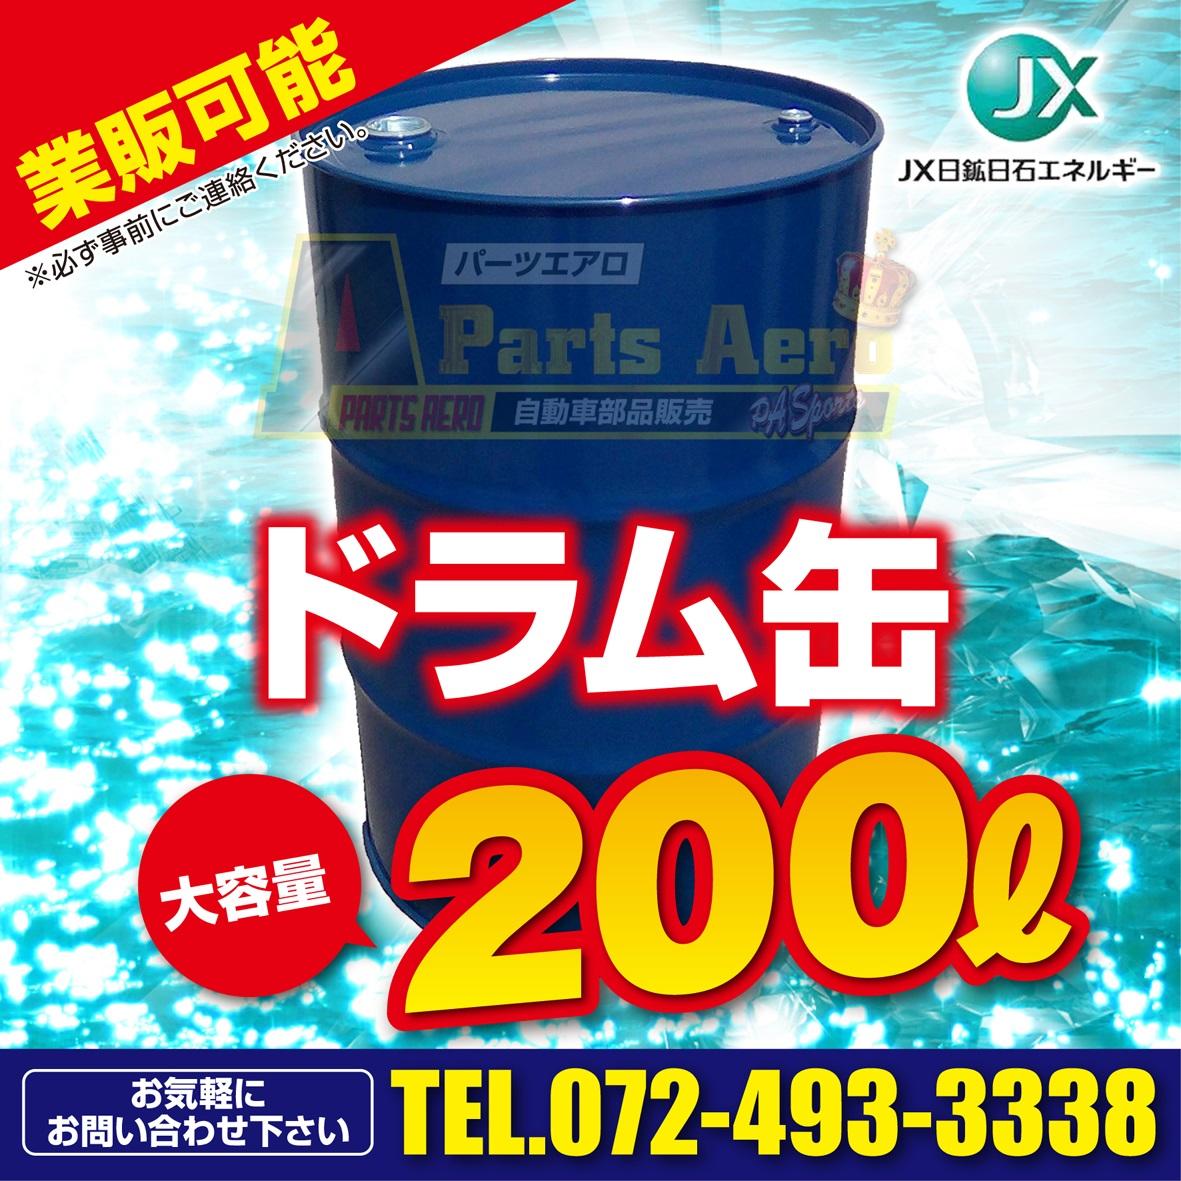 JX日鉱日石エネルギー エンジンオイルSL/CF 10W-30 200L(ガソリン/ディーゼル兼用) (業販可能) JX日鉱日石エネルギー エンジンオイルSL/CF 10W-30 200L(ガソリン/ディーゼル兼用) (業販可能)